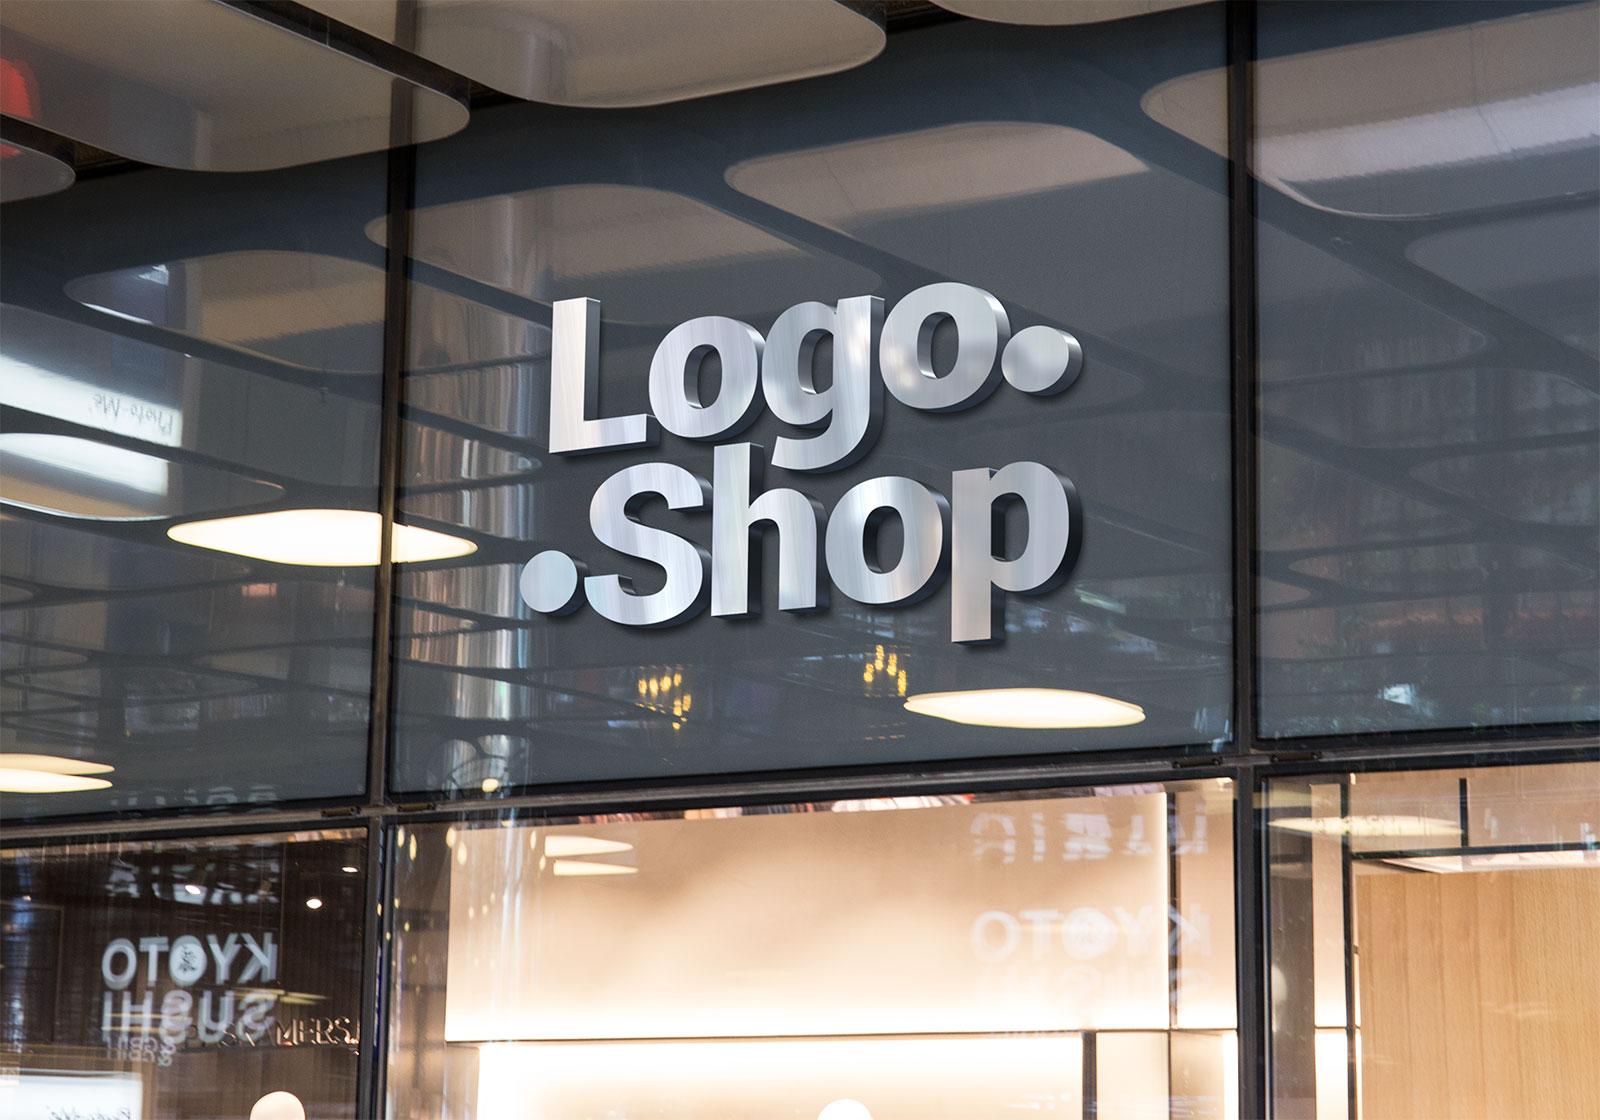 Free-Shop-Name-Fascia-Logo-Mockup-PSD